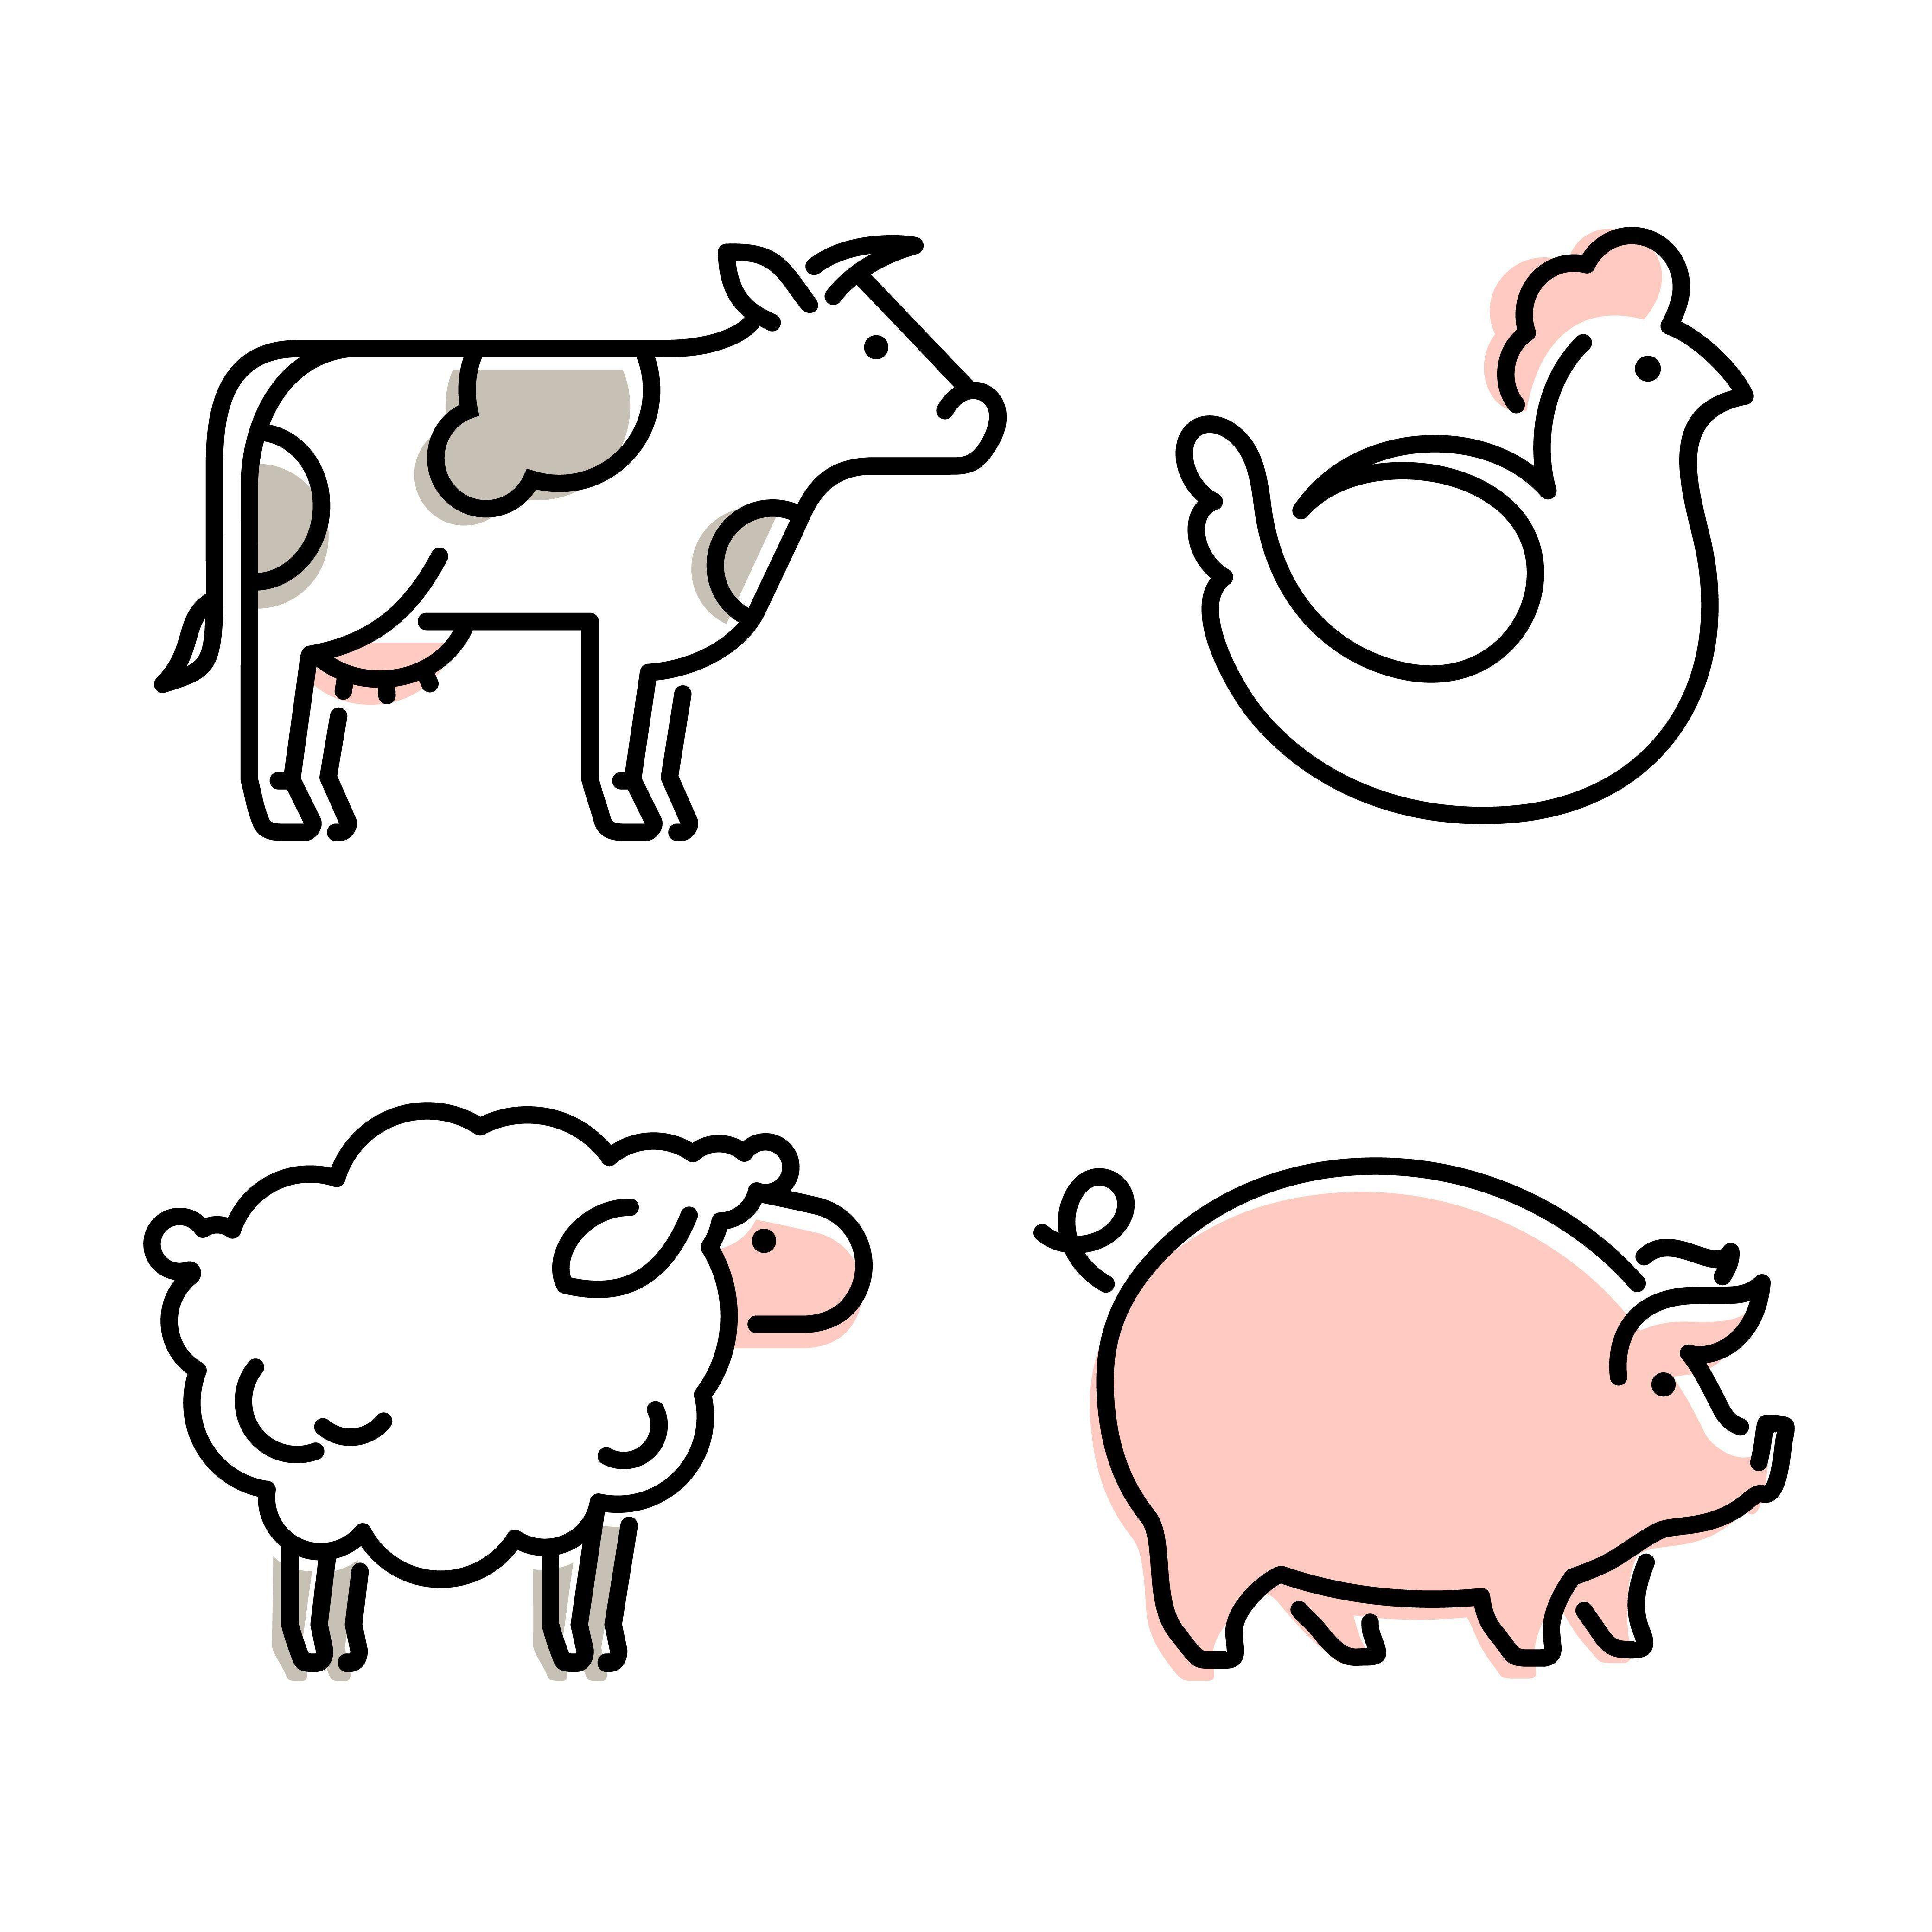 Farm Animals Vector Icon Sheep Cow Stock Vector Royalty Free 1513726466 Sheep Illustration Animal Icon Cow Illustration